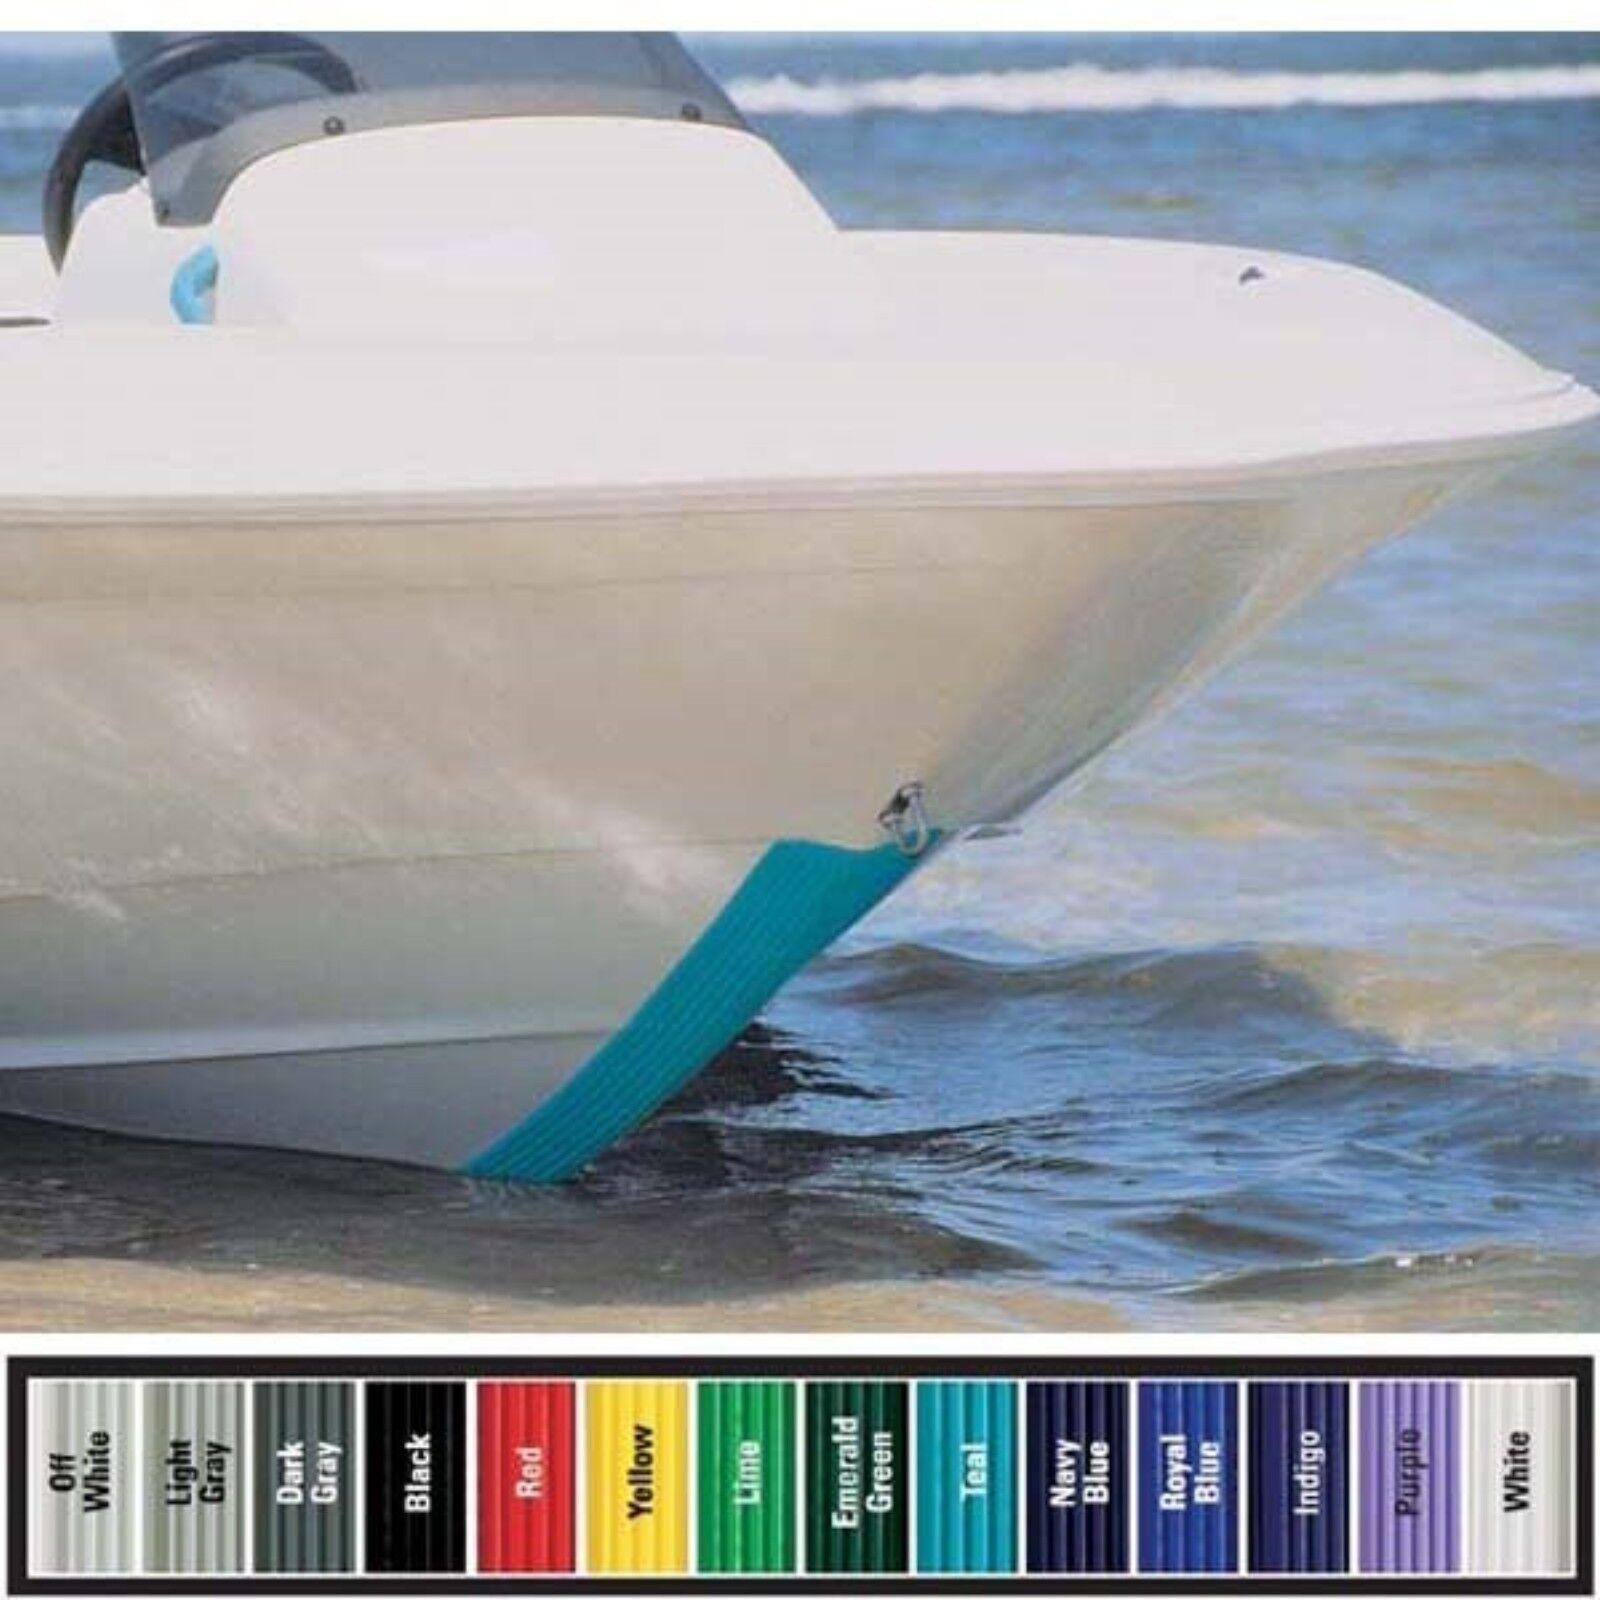 7ft. 3M OFF-WHITE- KeelShield Hull Protector